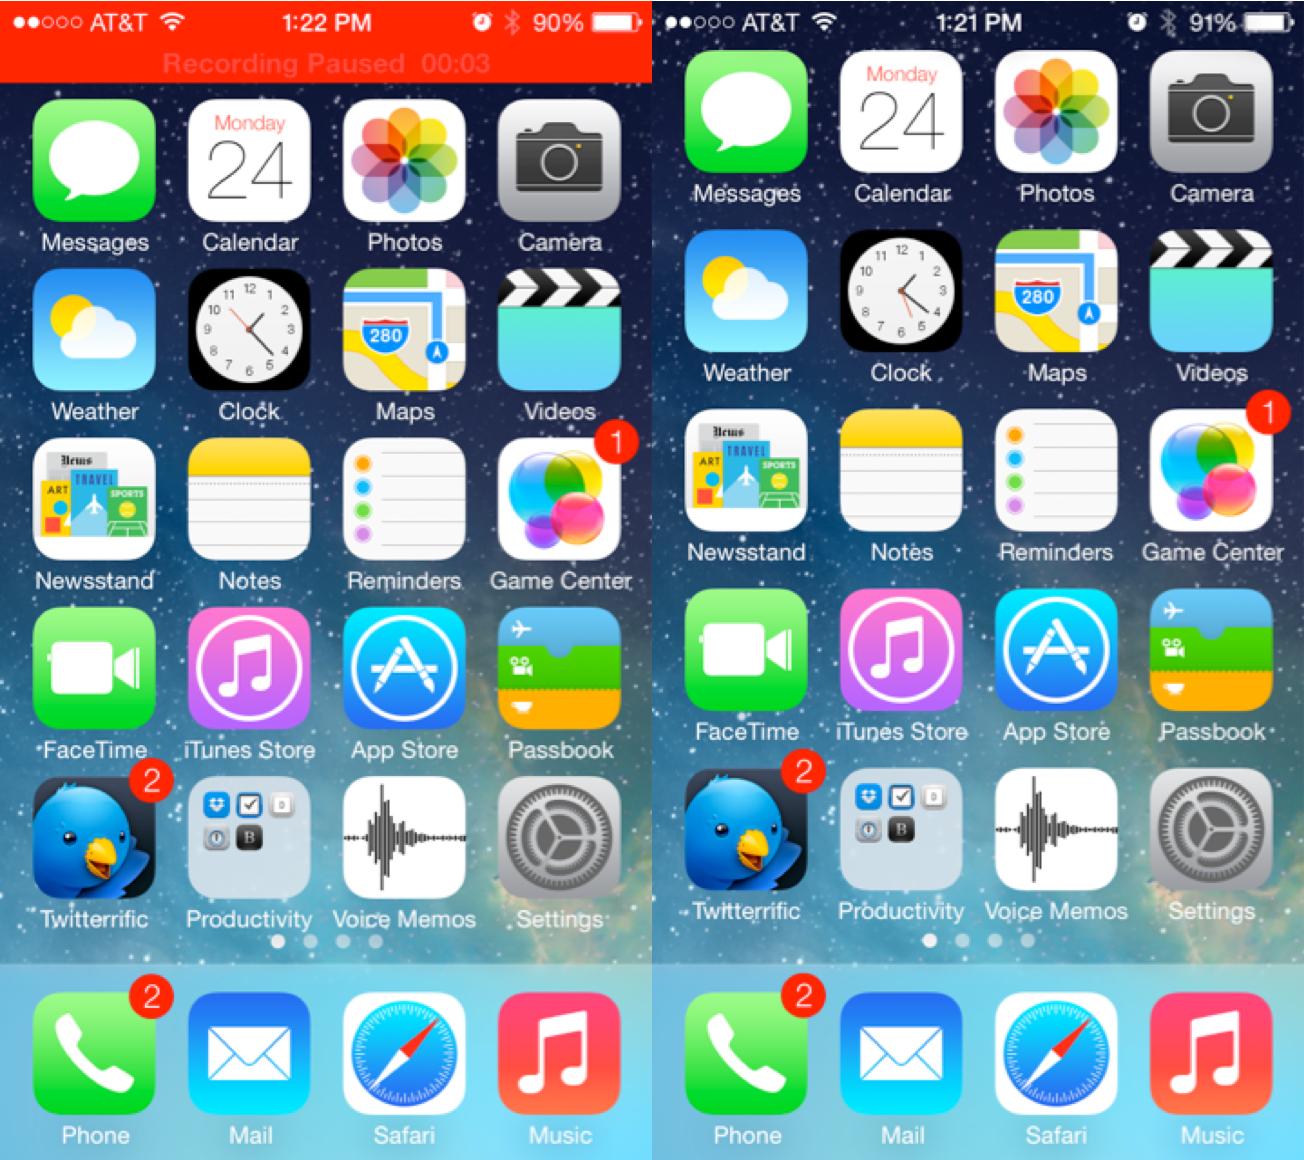 IOS 7 Beta 2 Siri has a brother